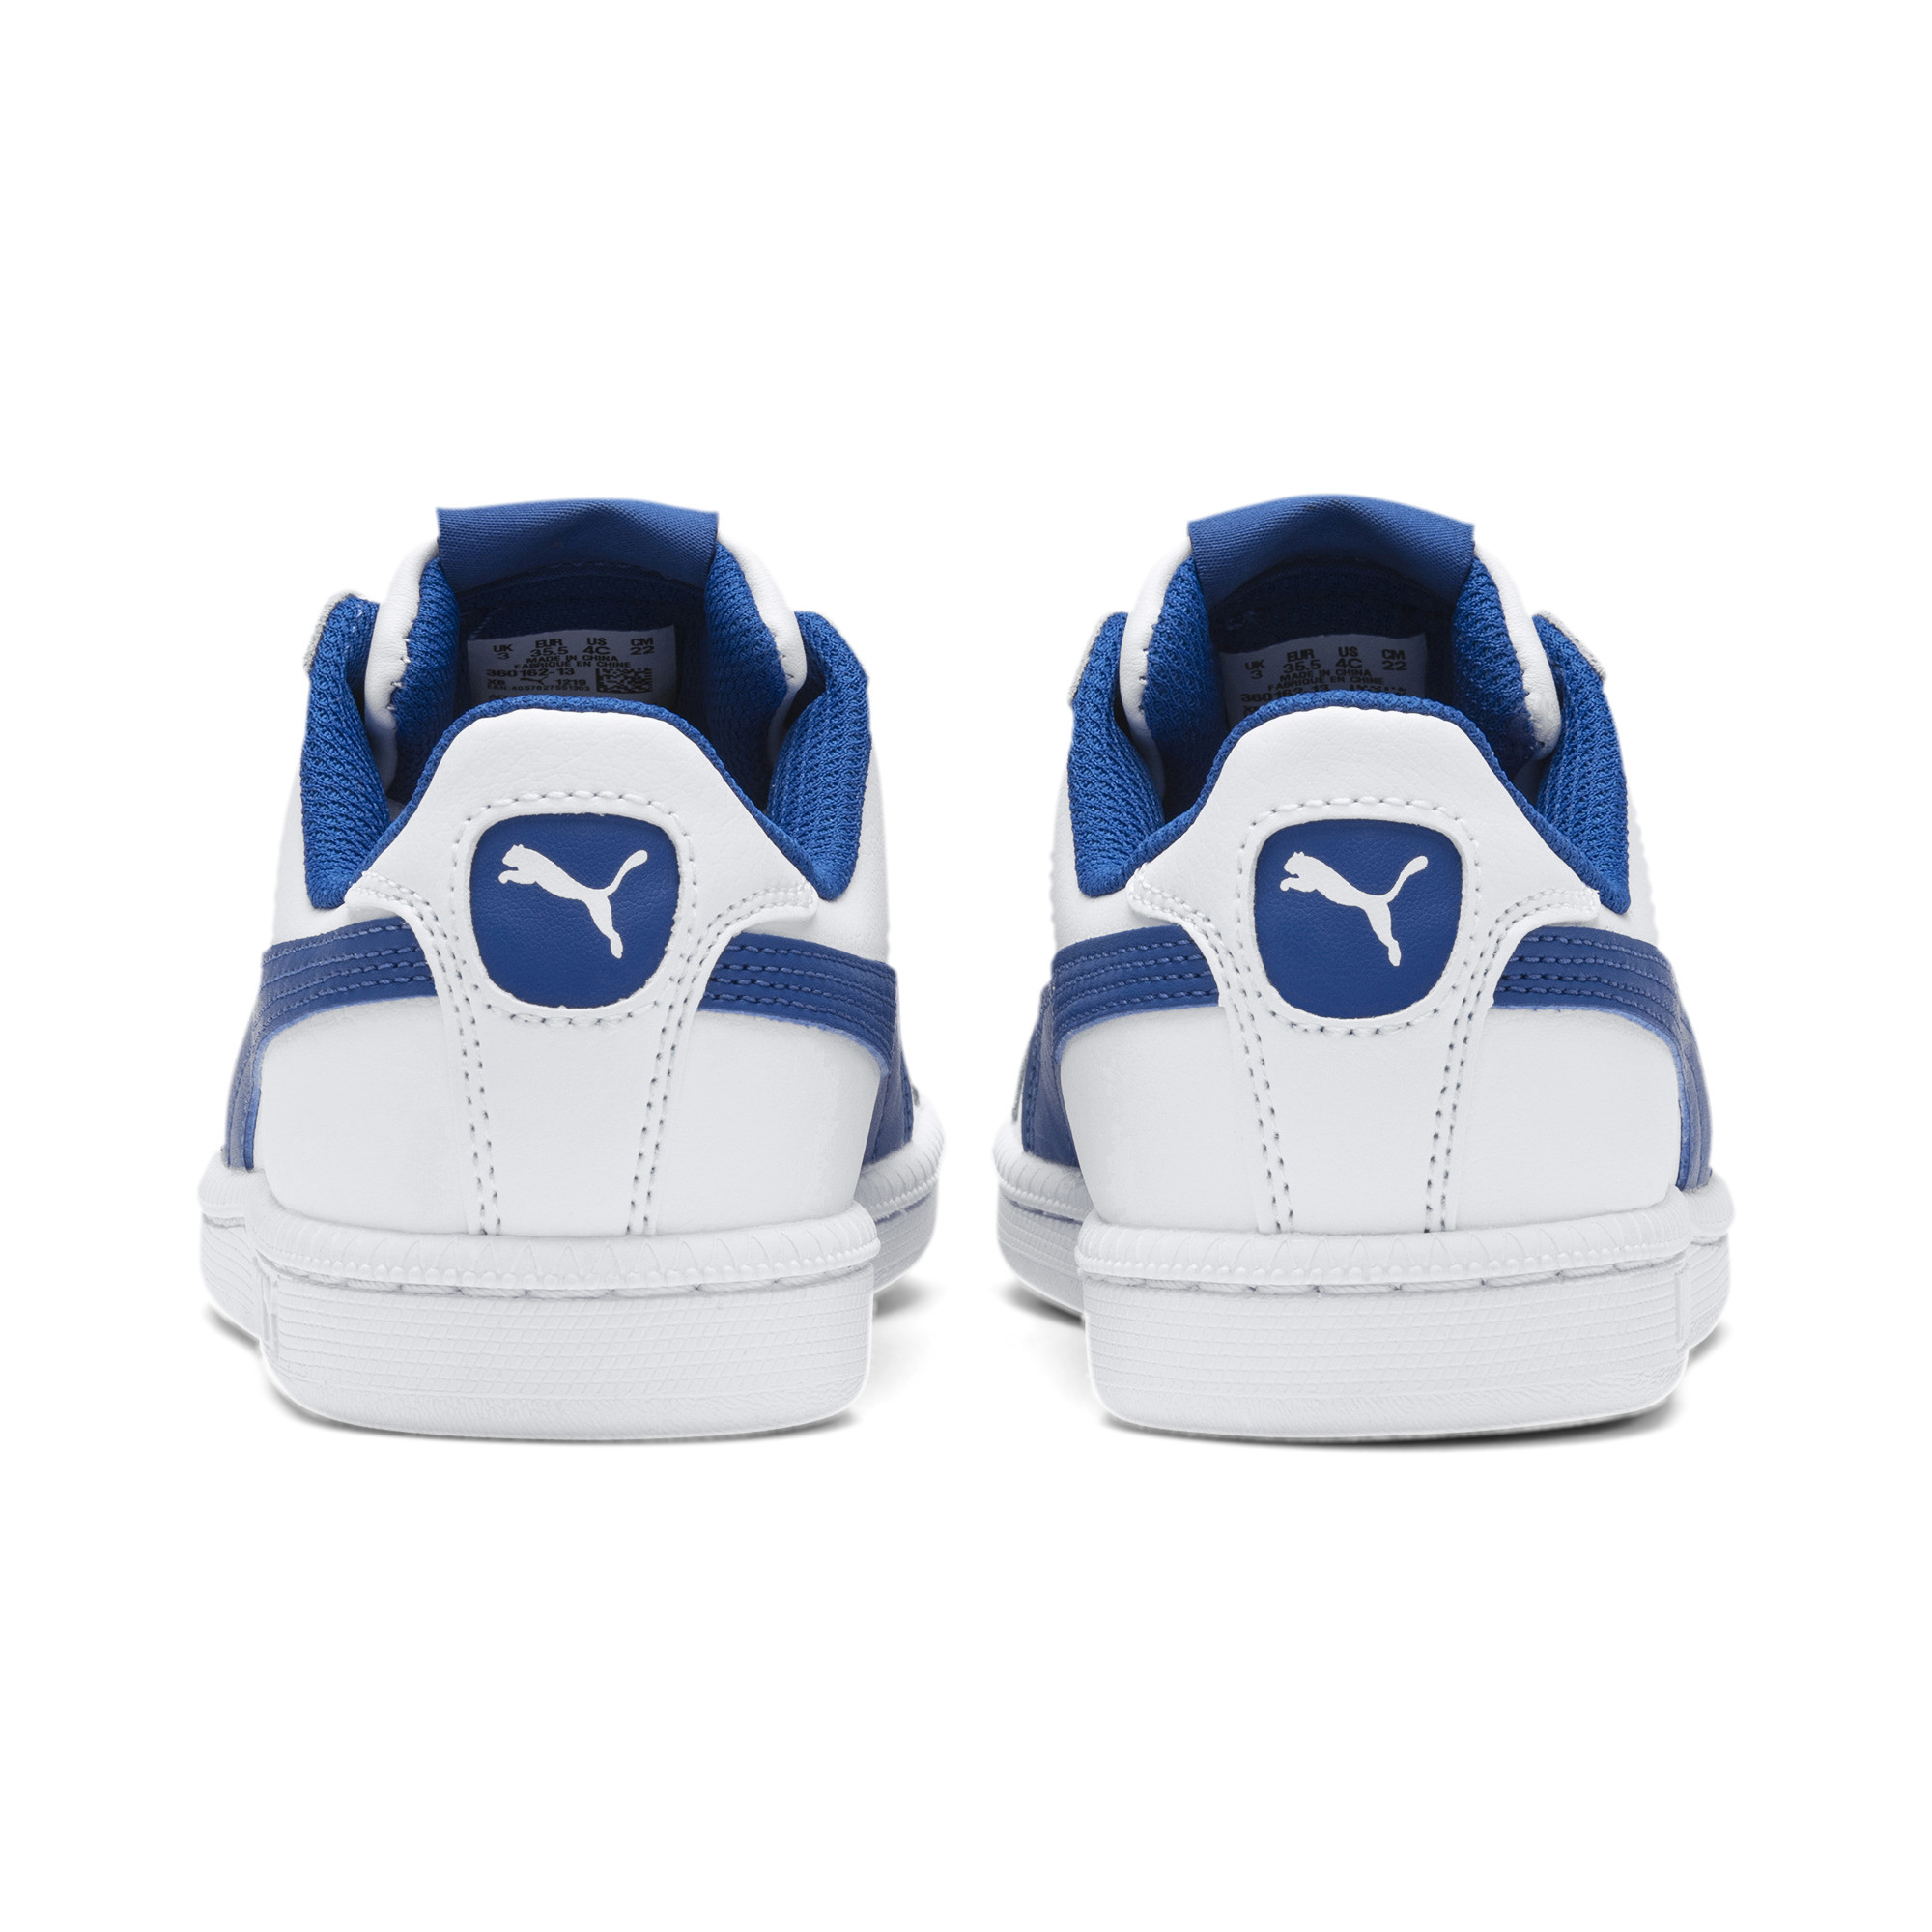 PUMA-Smash-Jr-Sneaker-Unisex-Schuhe-Kinder-Neu Indexbild 13